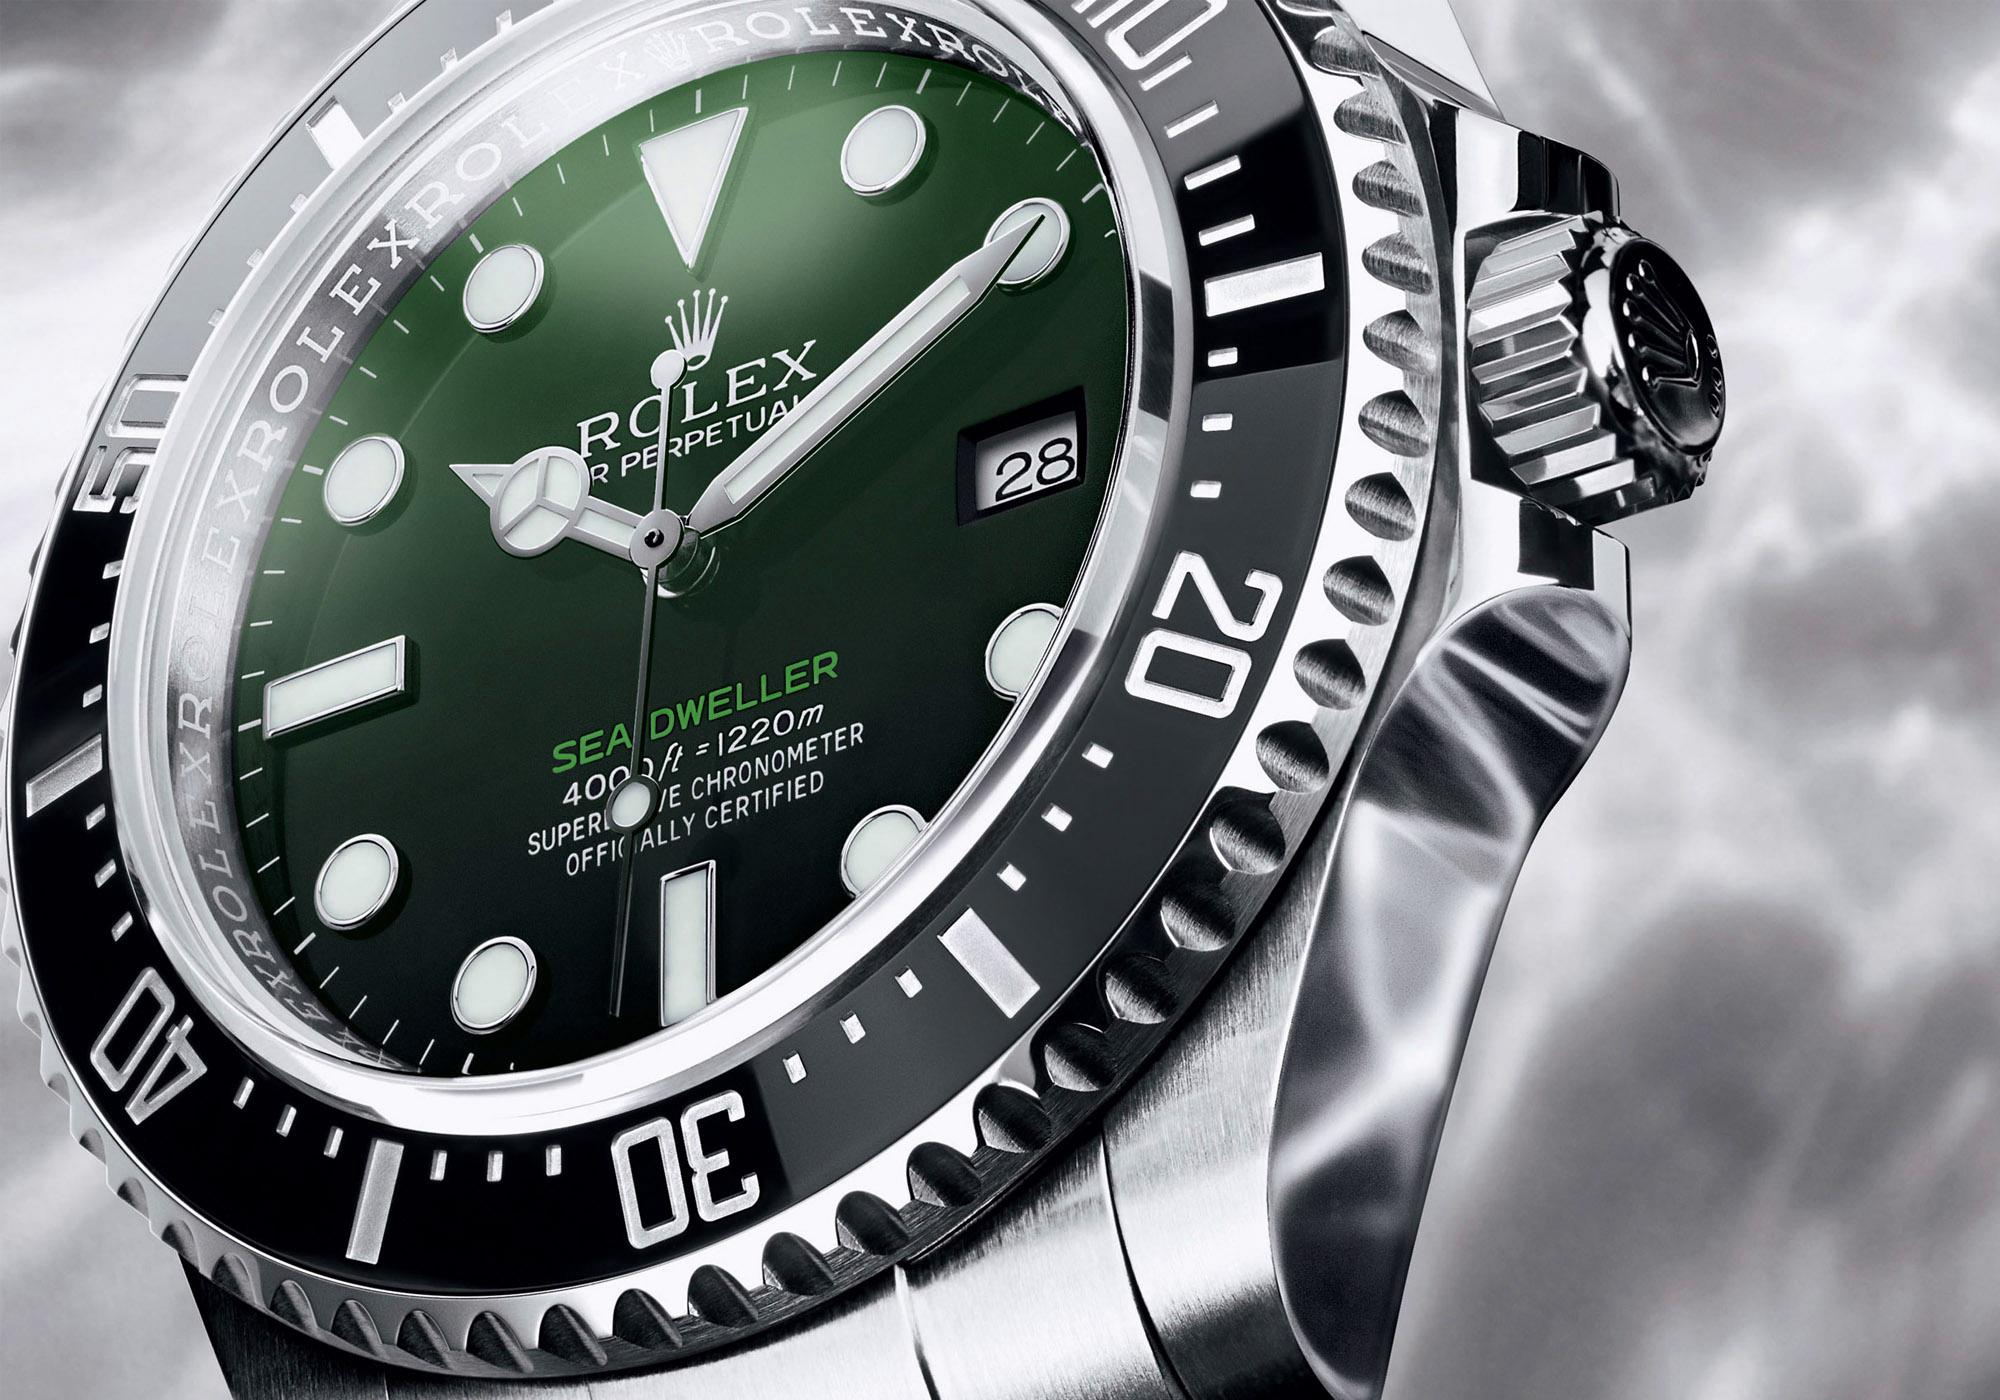 Rolex-Sea-Dweller-50th-anniversary-Gradient-Green-Dial-Rolex-Baselworld-2017-Rolex-Predictions-2017-3